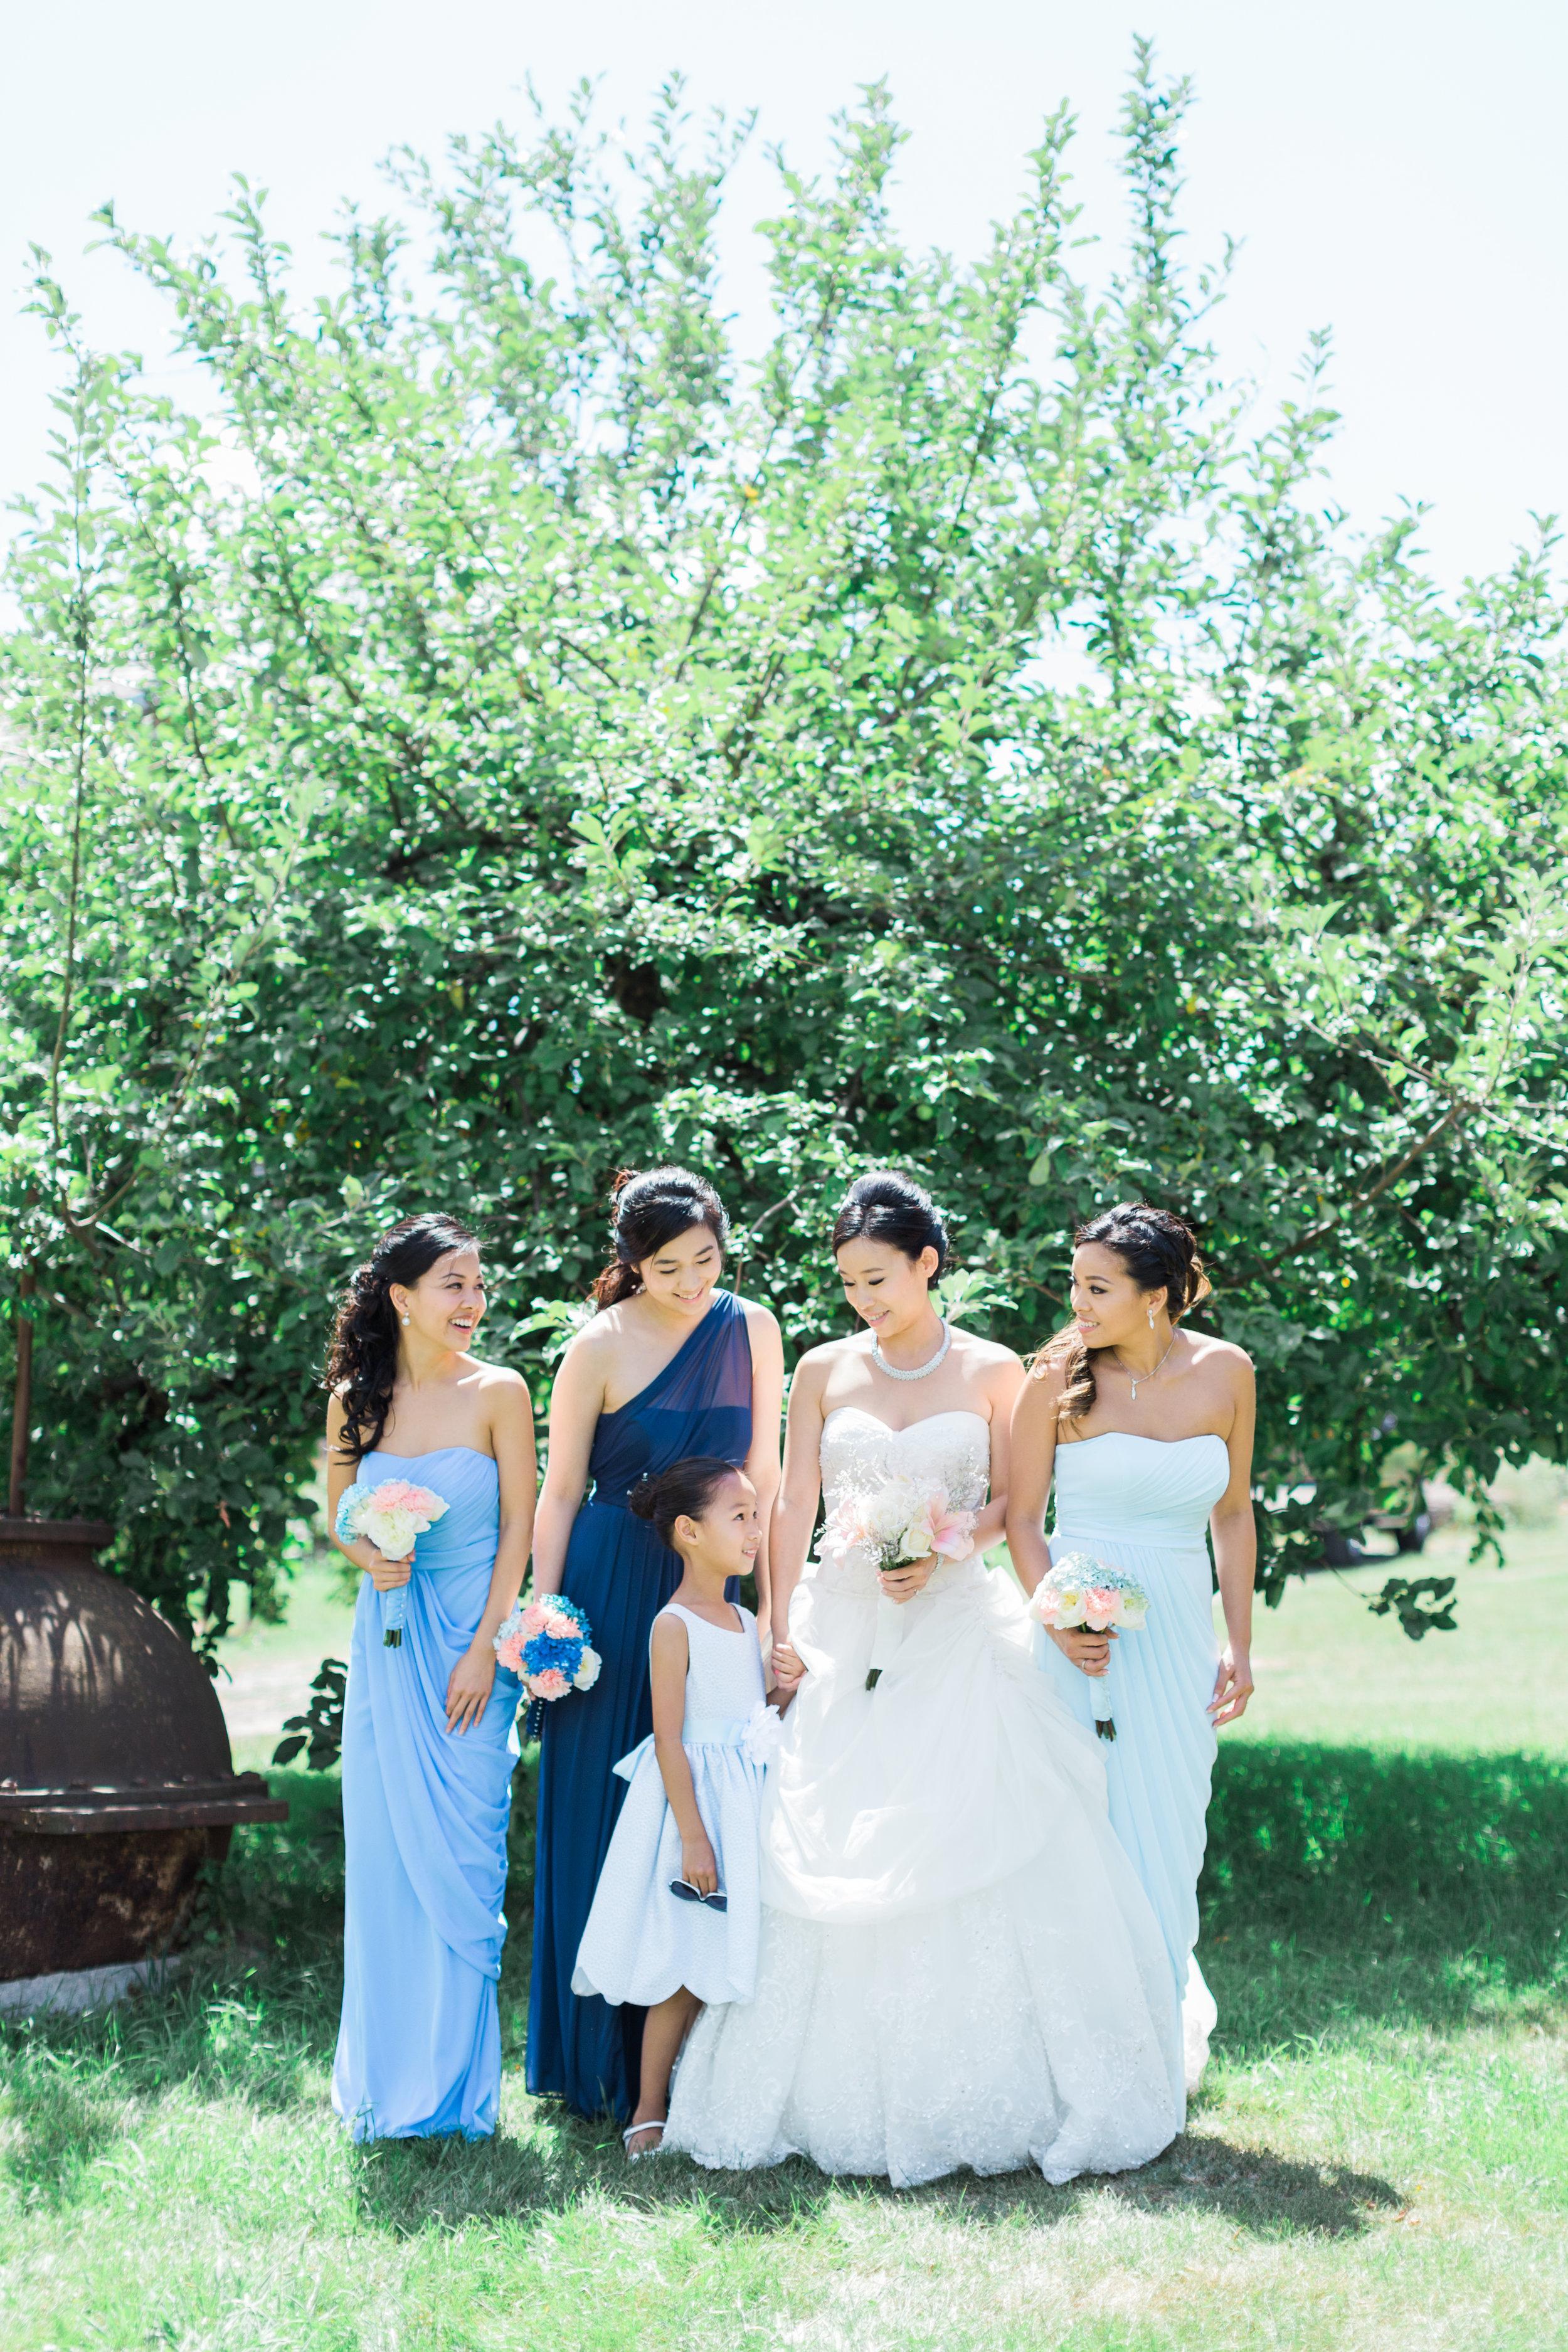 Toronto Fine Art Photographer - Markham Museum Wedding - Bridal Party Portraits-35.jpg